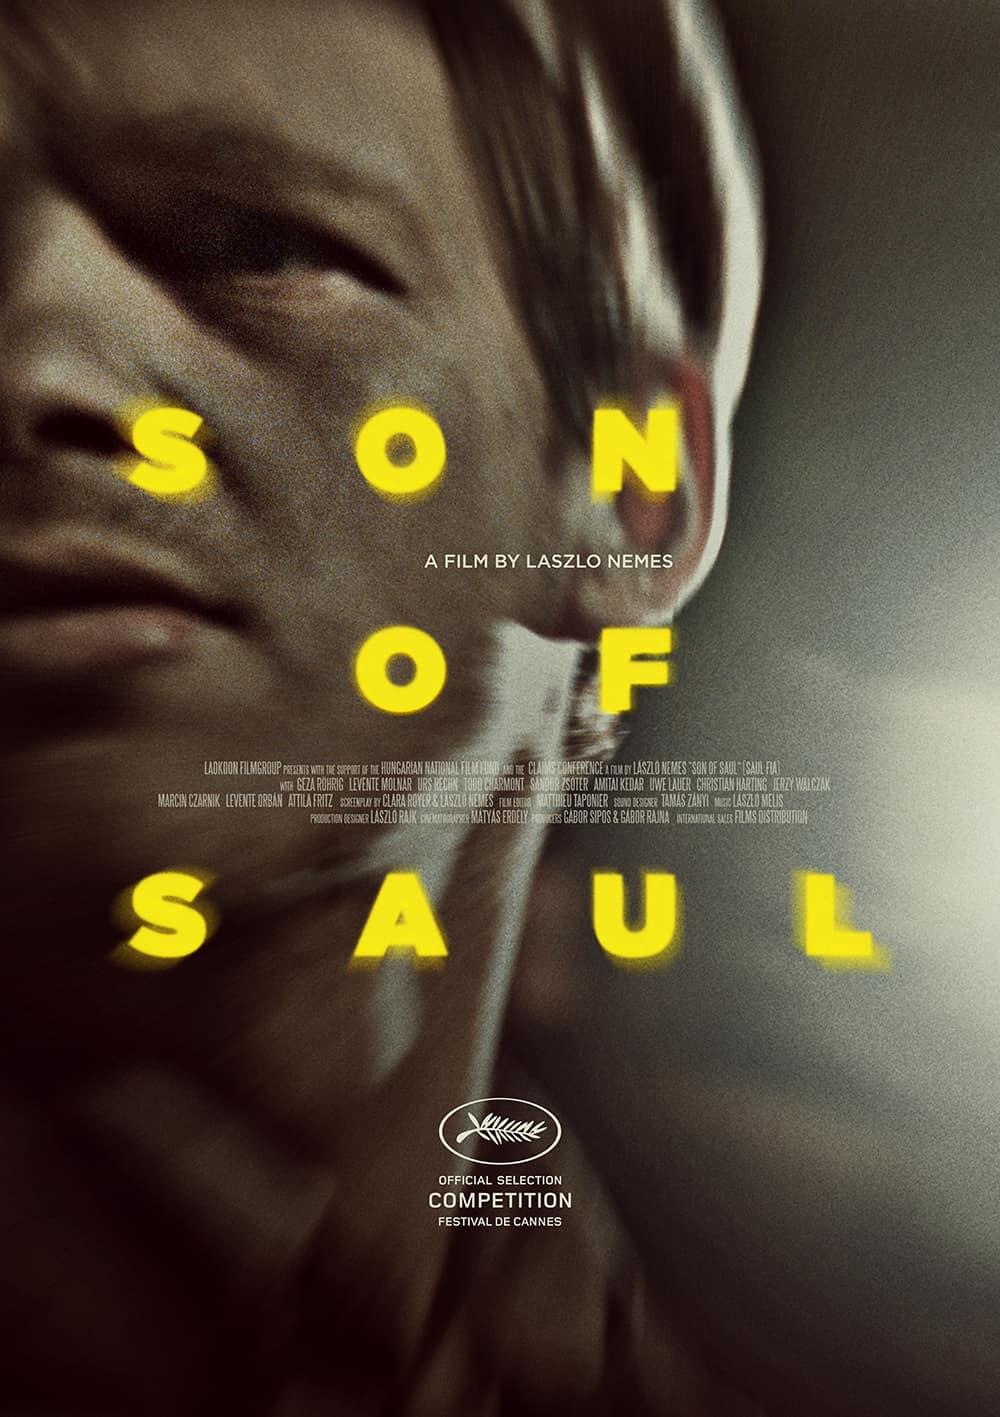 sonofsaul-poster